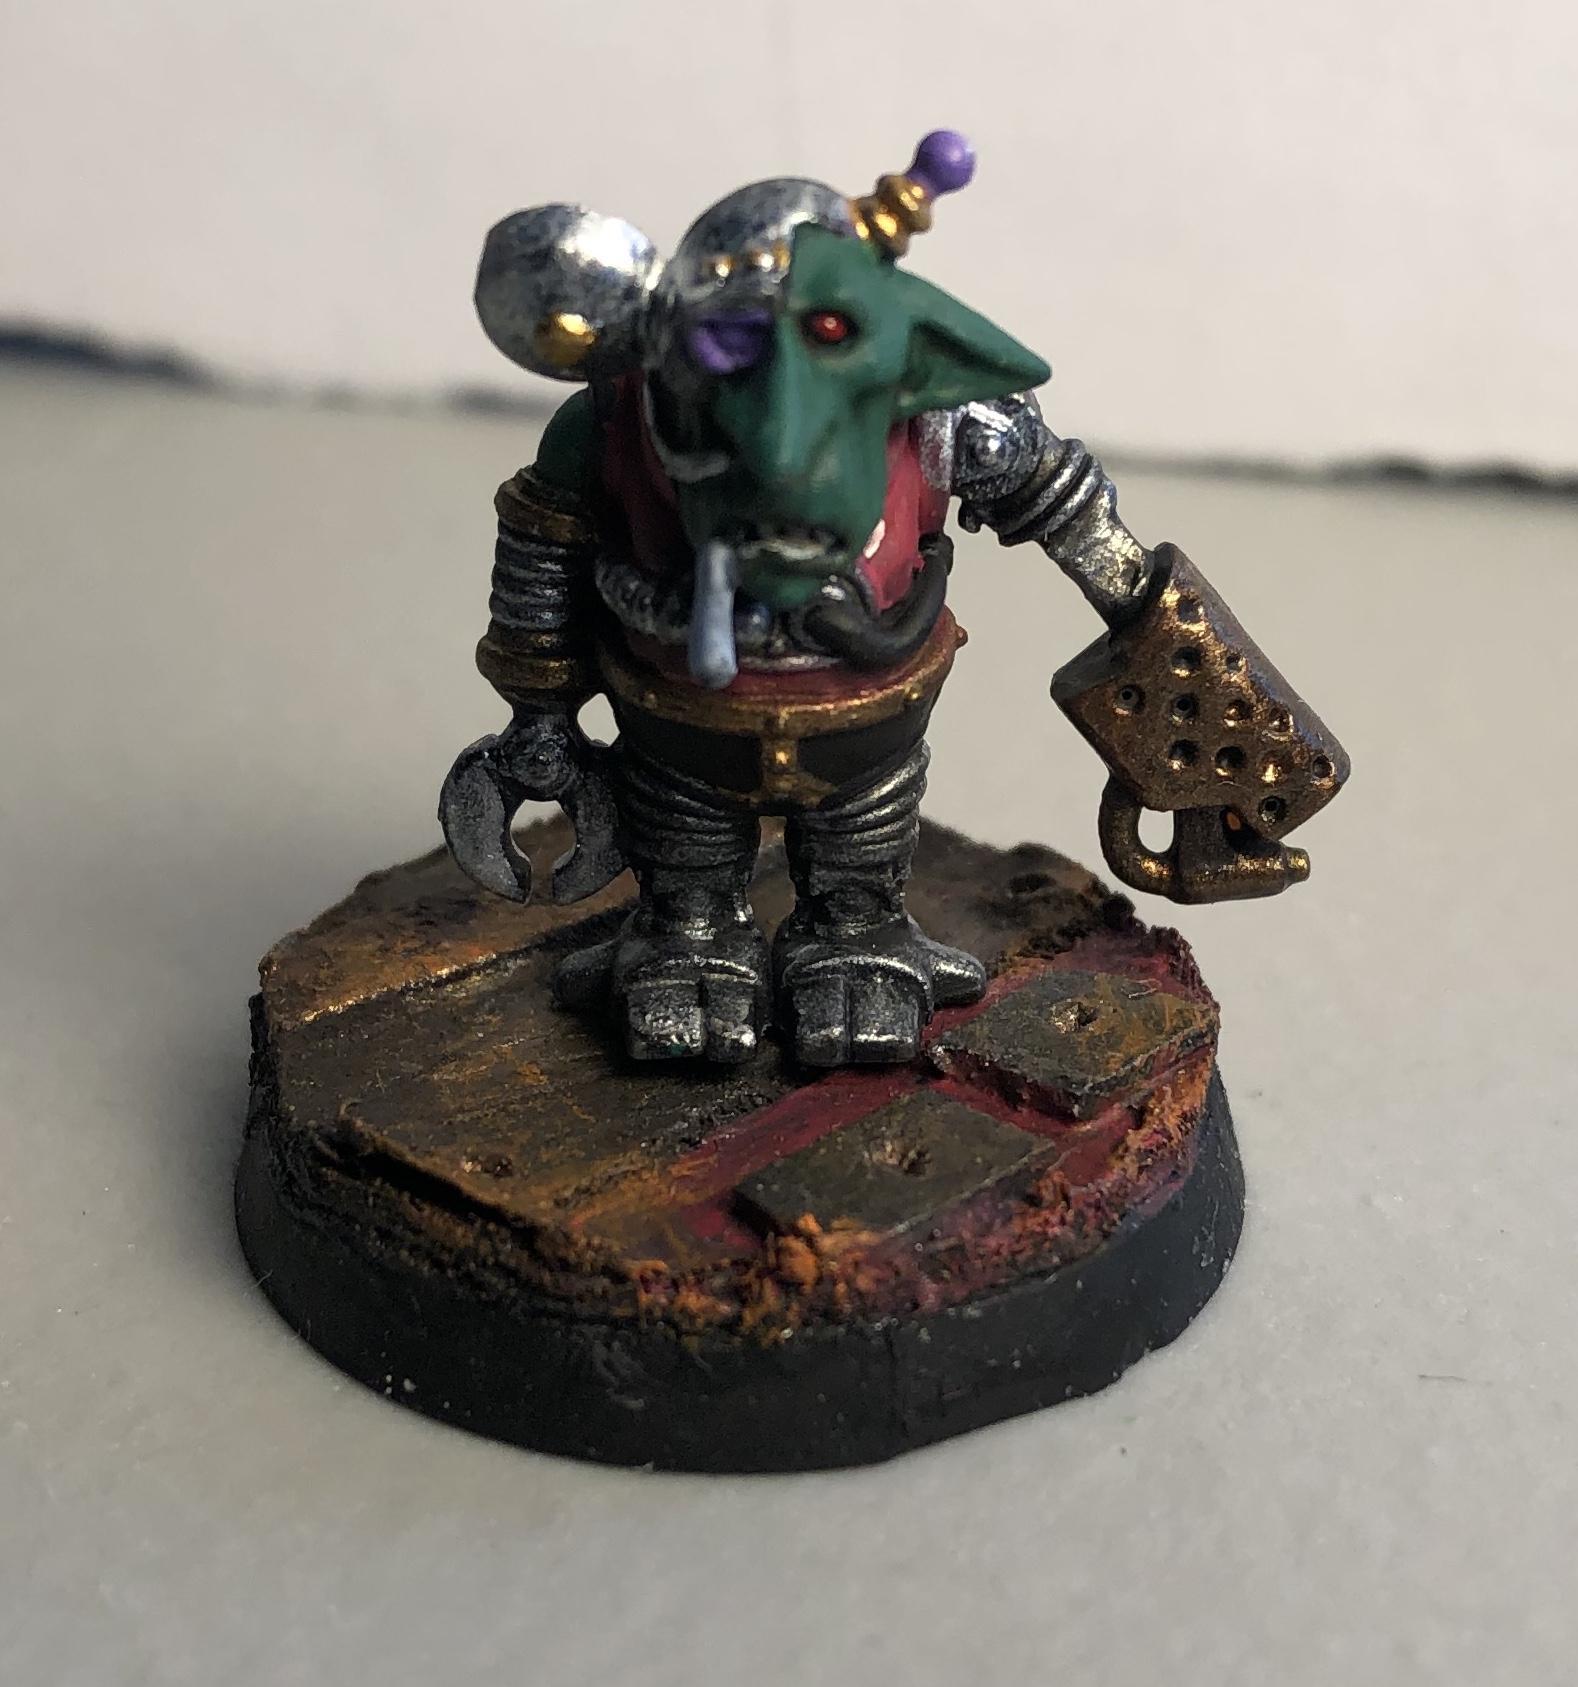 Diorama, Goblin Servitor, Imperial Guard, Inquisition, Kitbash, Warhammer 40,000